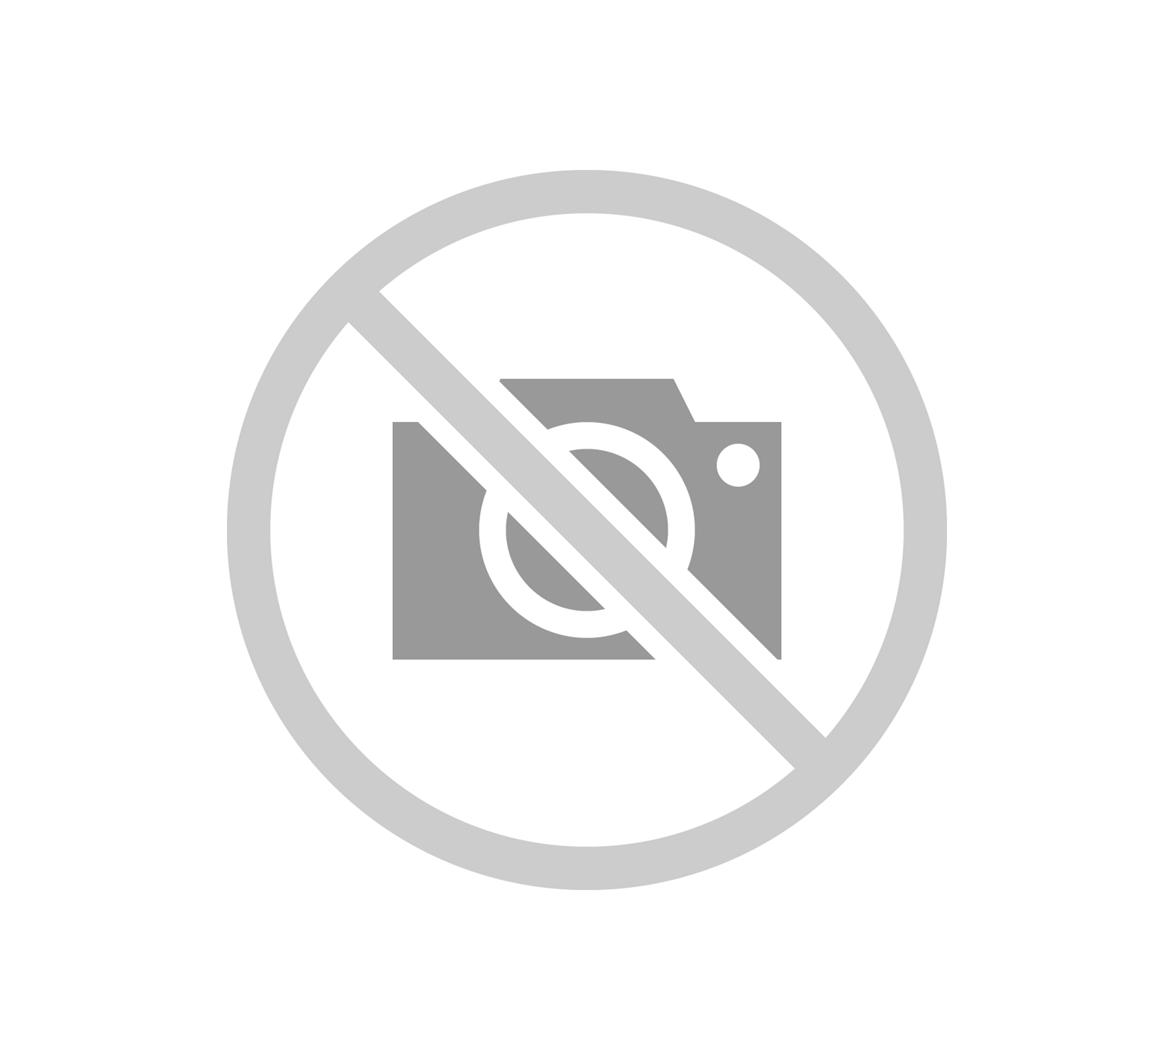 Taburet BALBOA Malmo 96 tmavě šedá